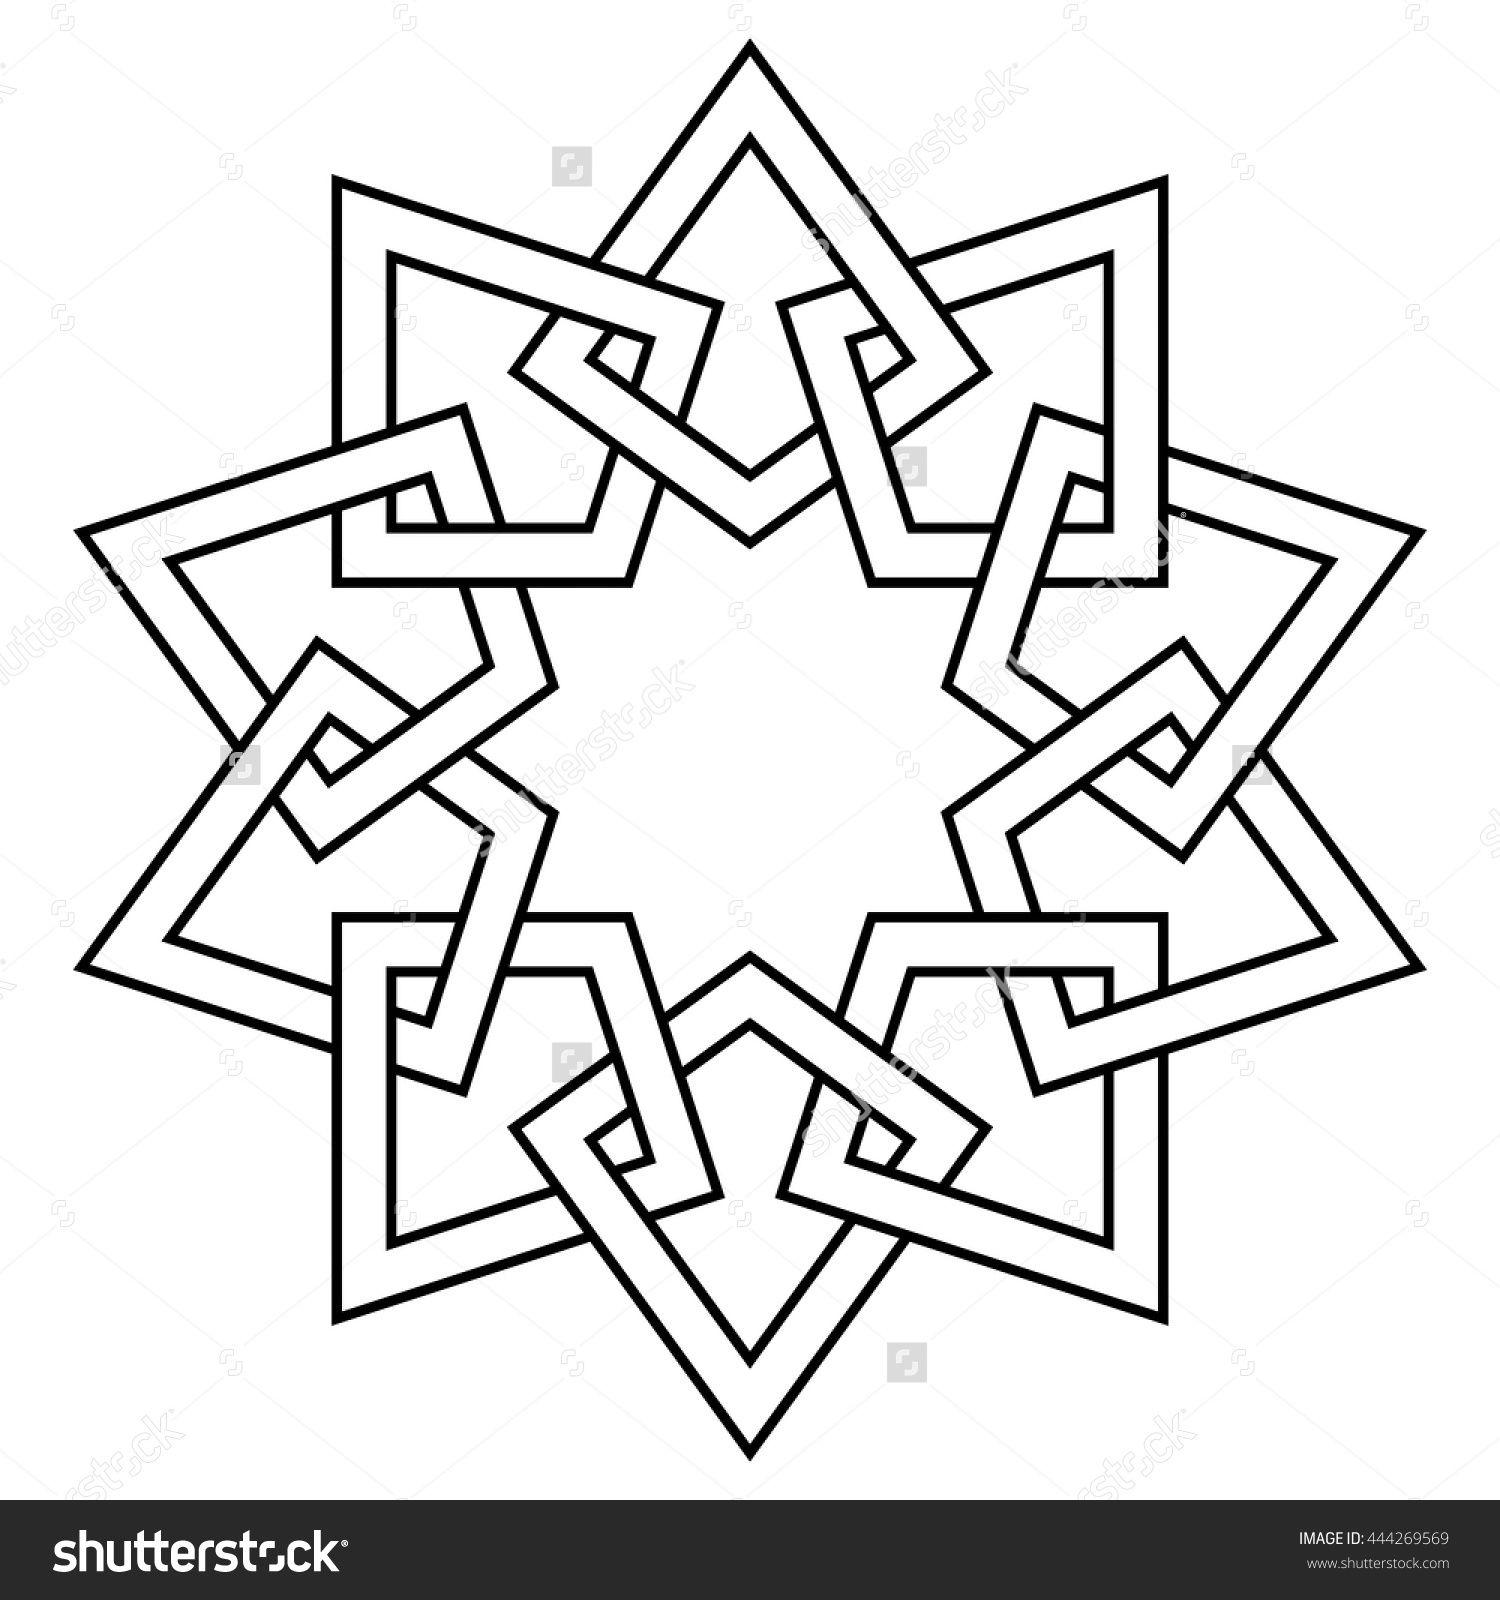 Pin By Ana Bu On Draw Geometric Drawing Islamic Art